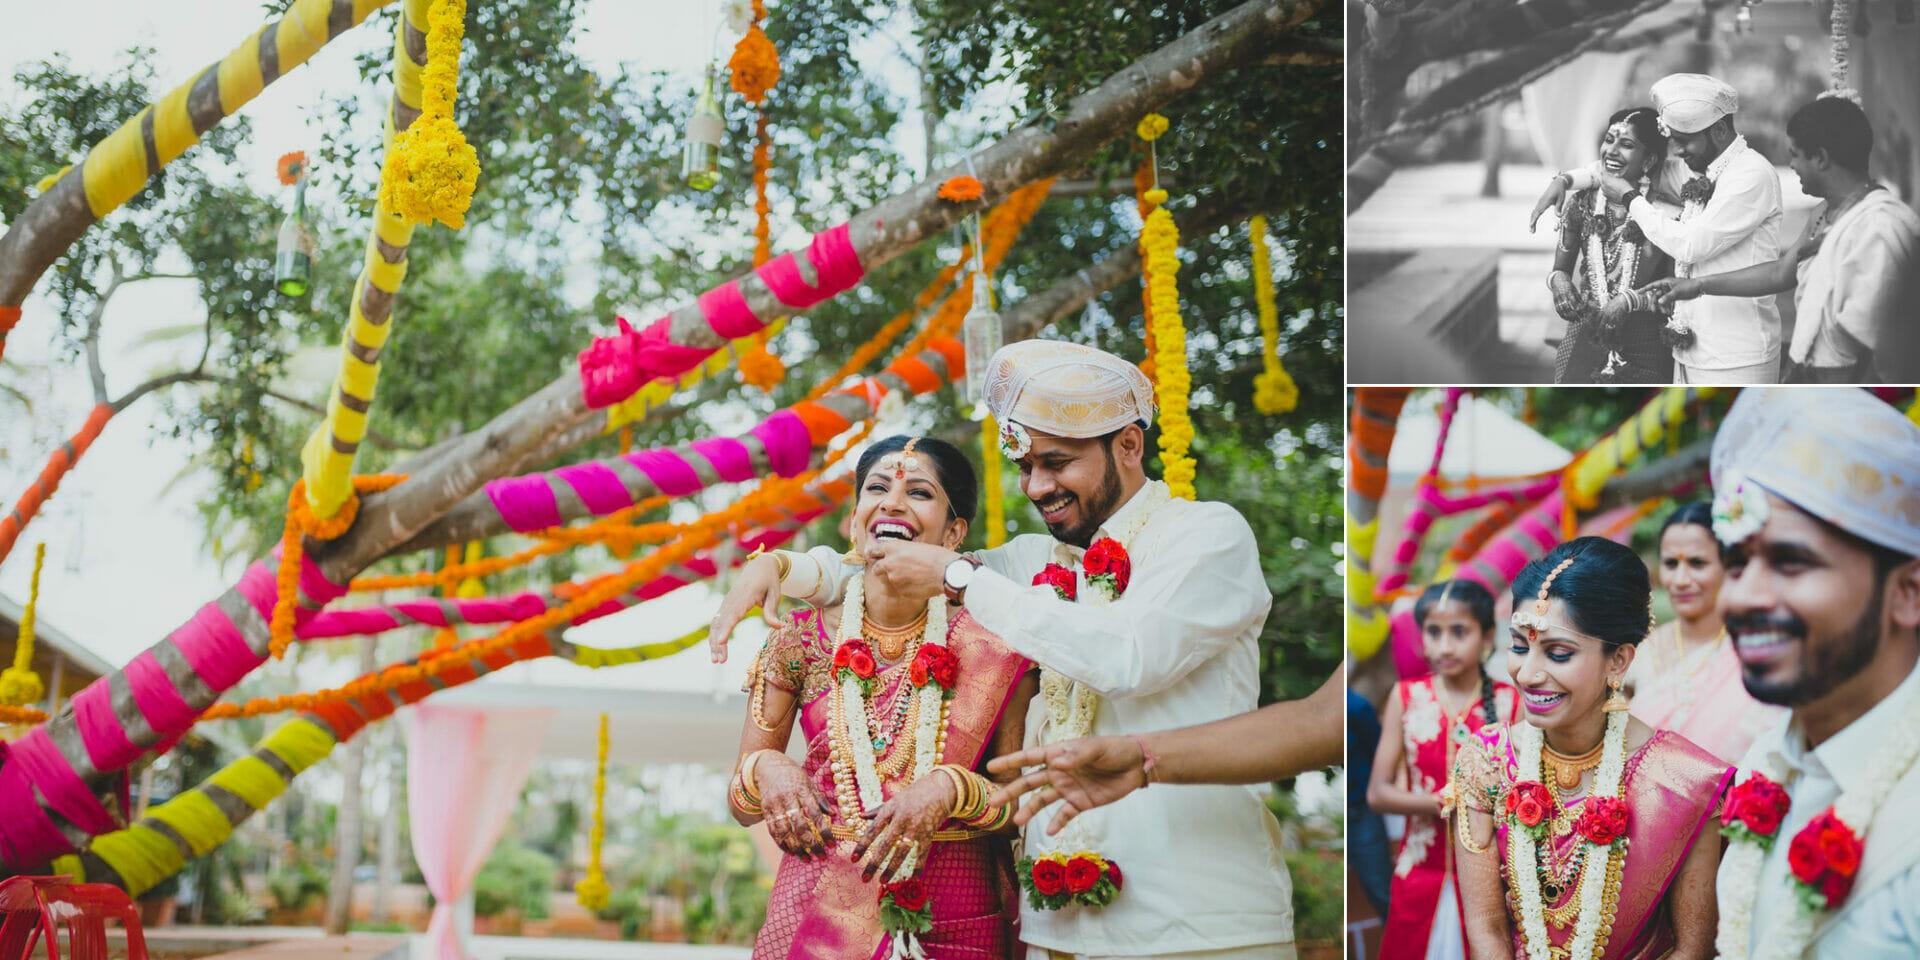 shruti annayya sree vikash photography wedding kalathur gardens 45